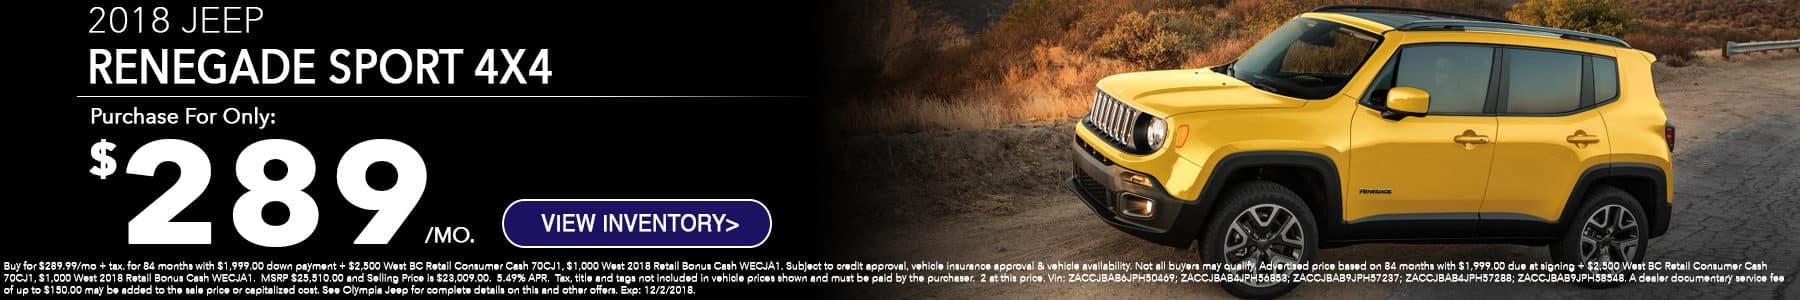 Jeep Renegade November Special